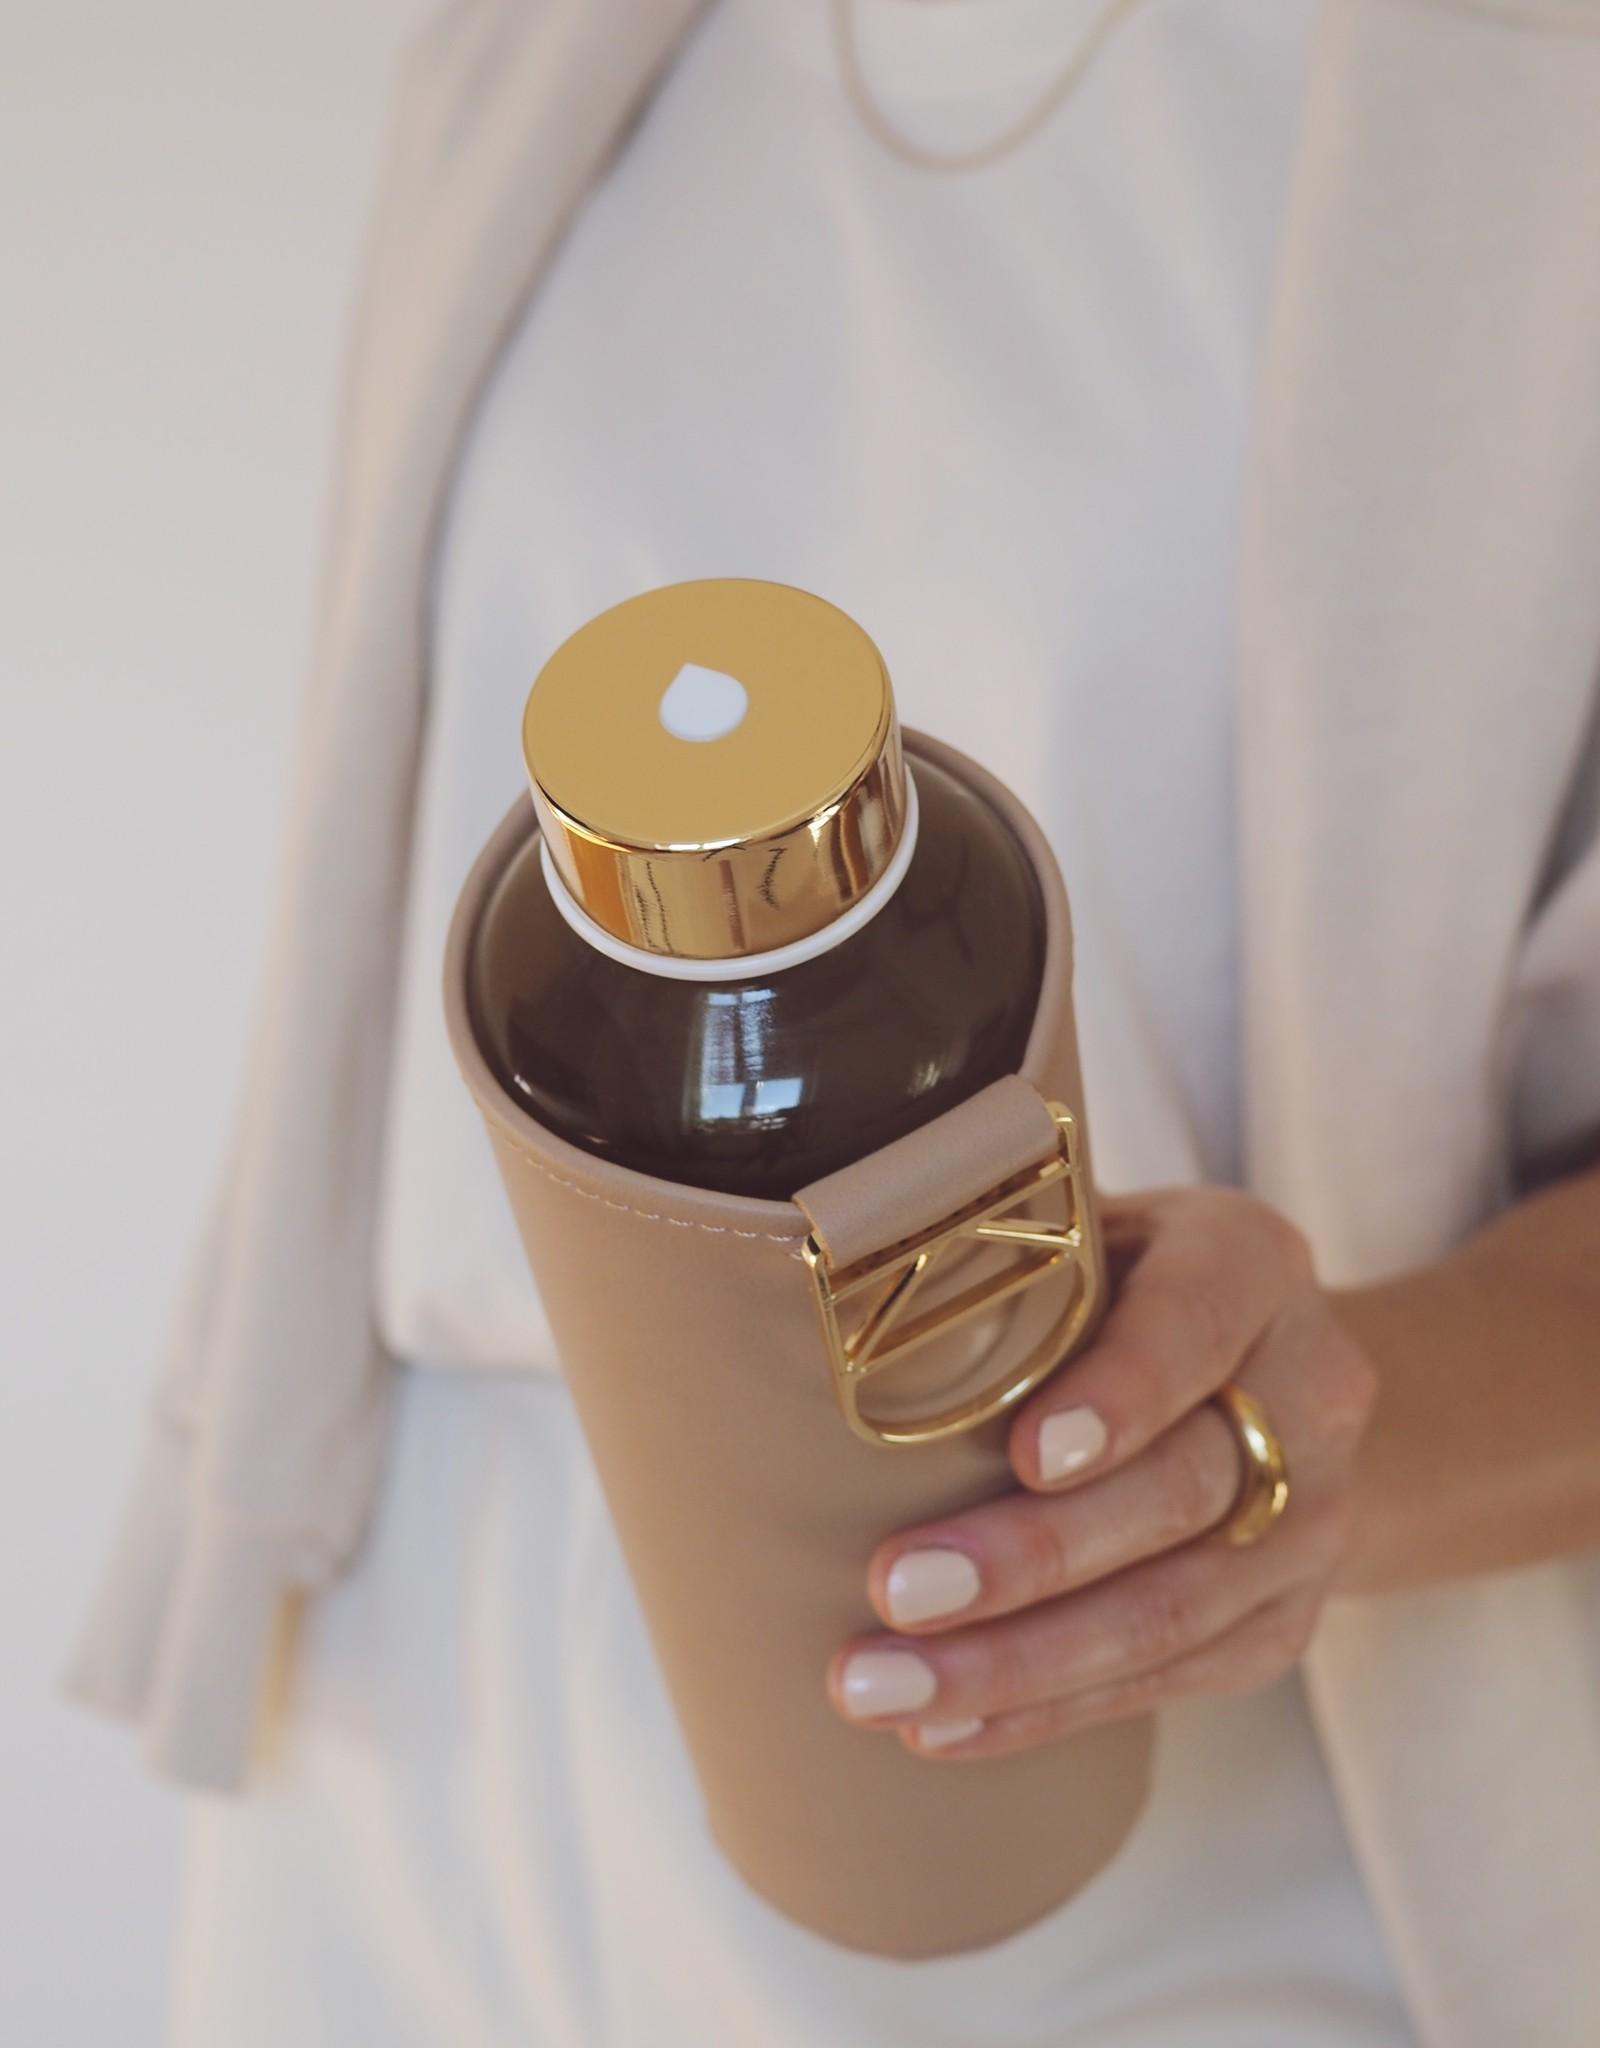 Equa Glazen drinkfles met cover - Sienna 750 ml